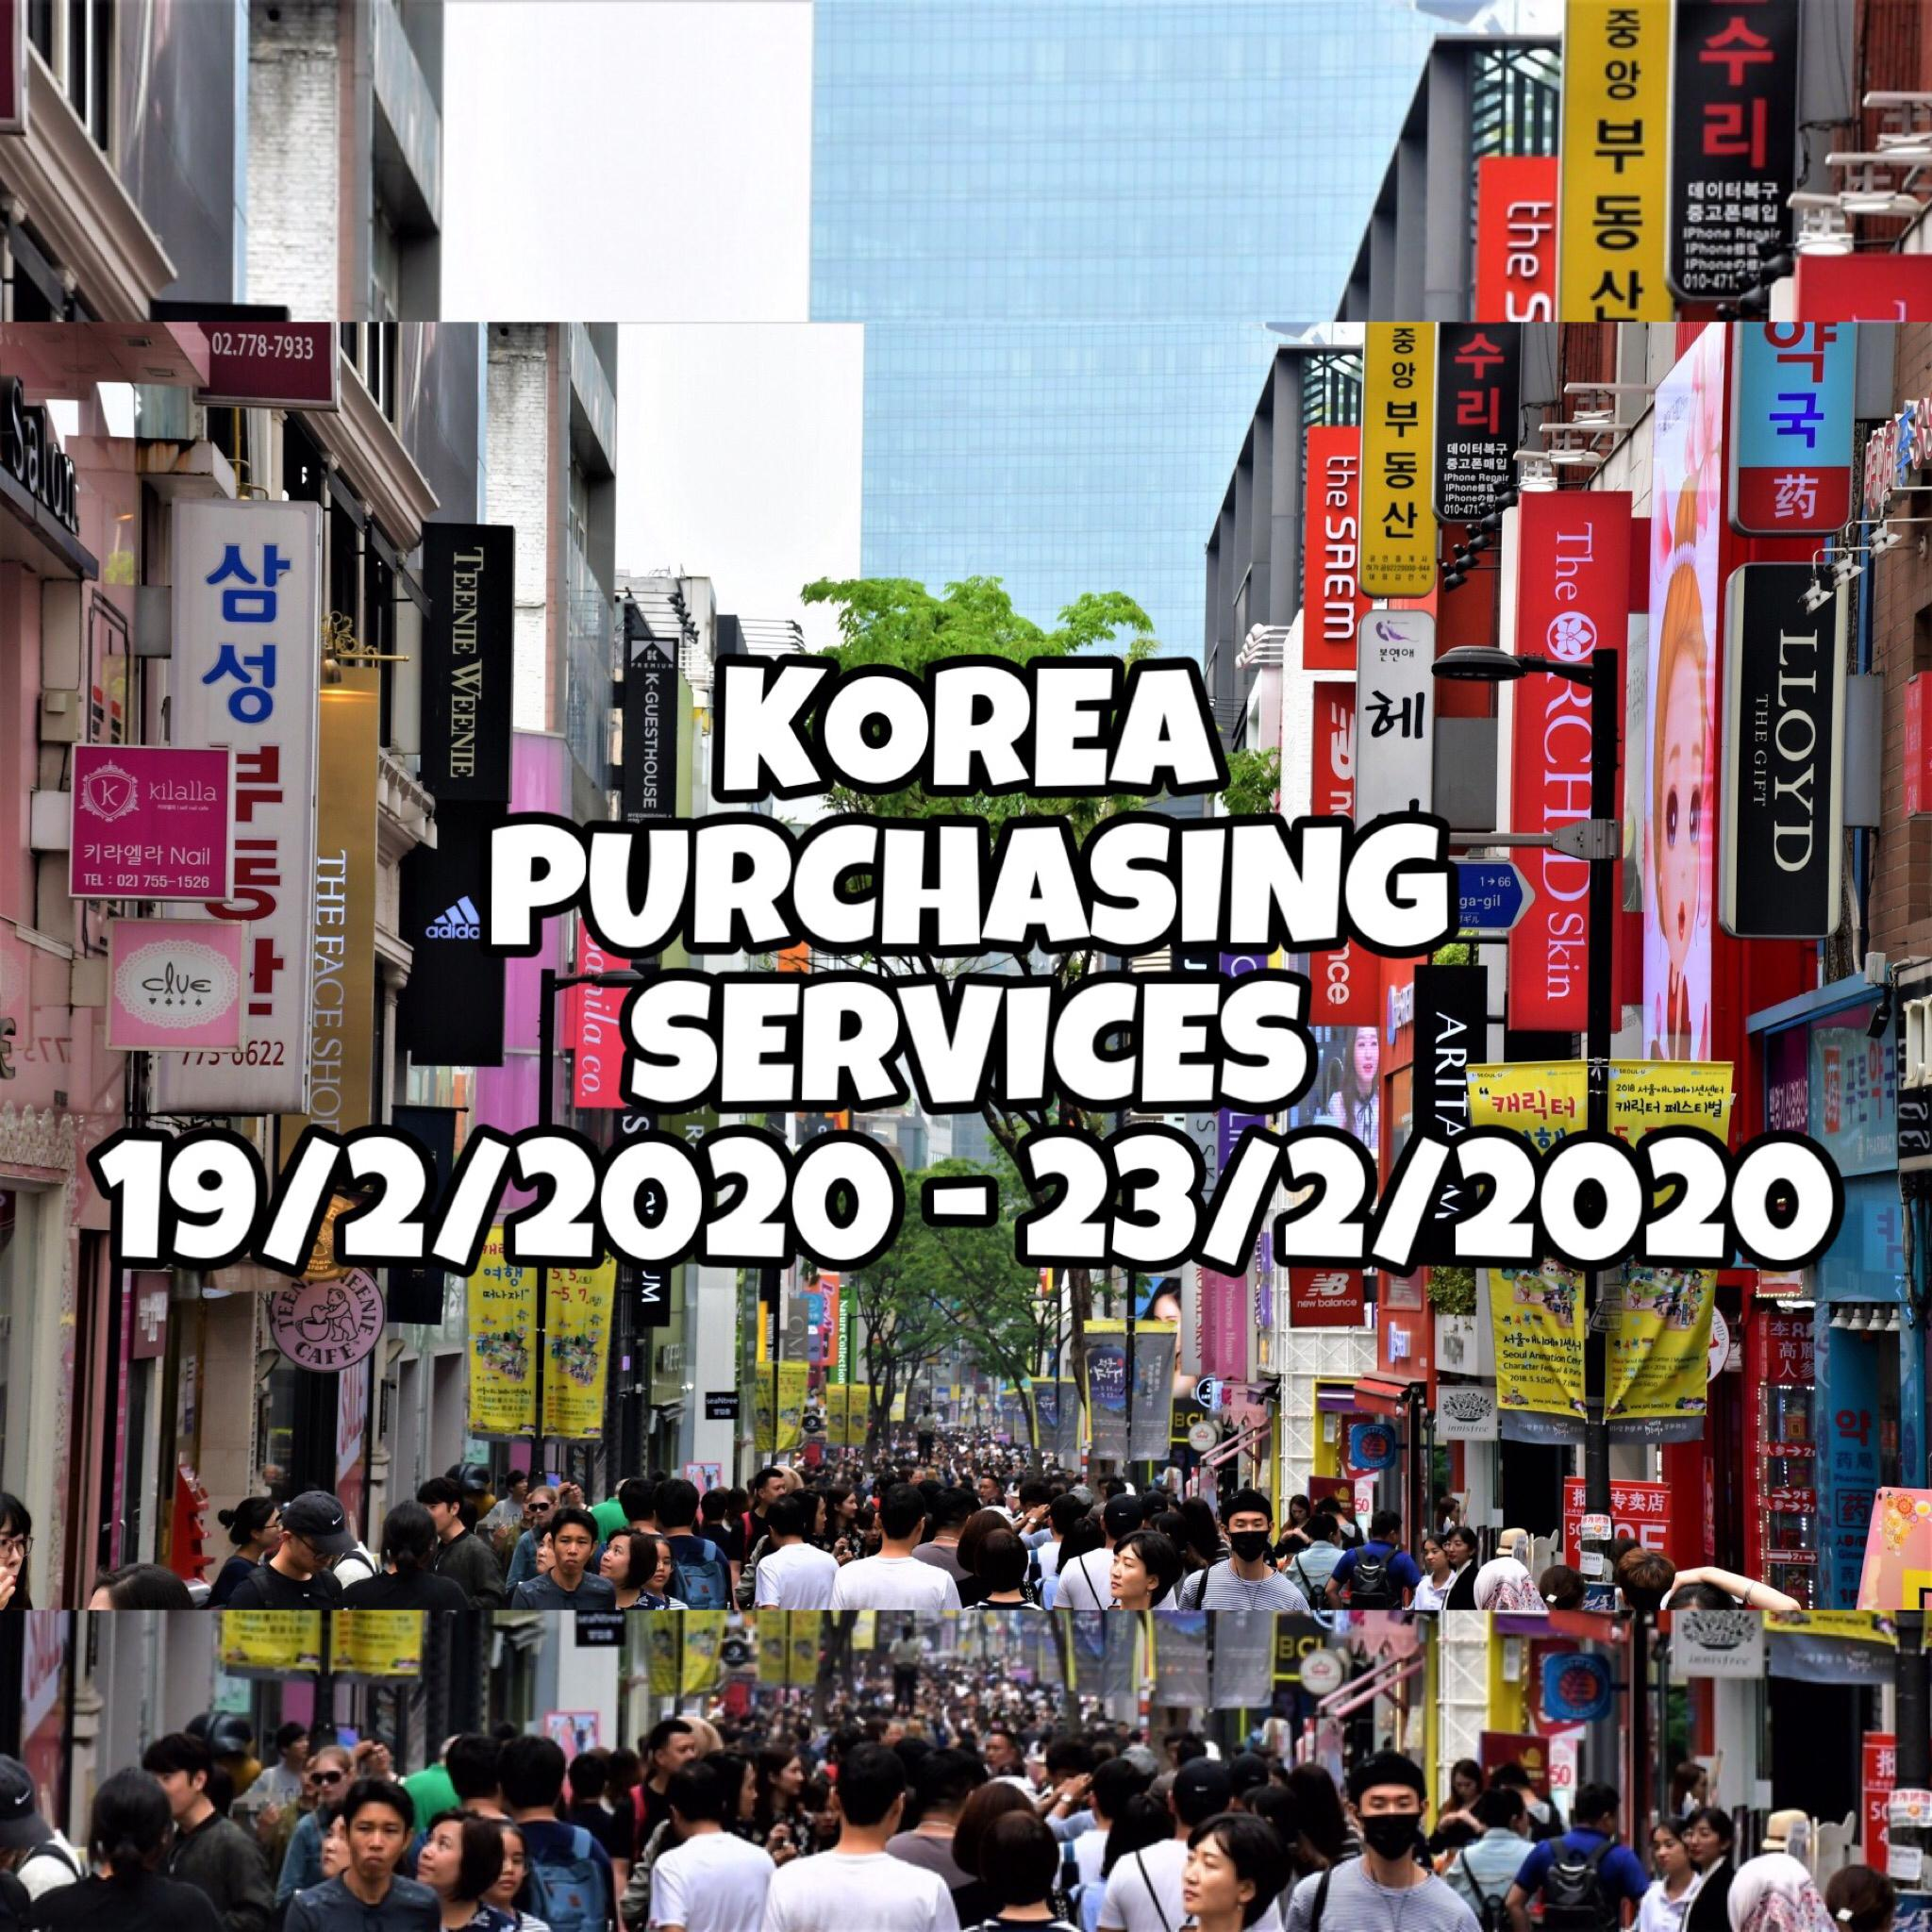 Korea purchasing services ( exo , bts , twice , red velvet , blackpink )